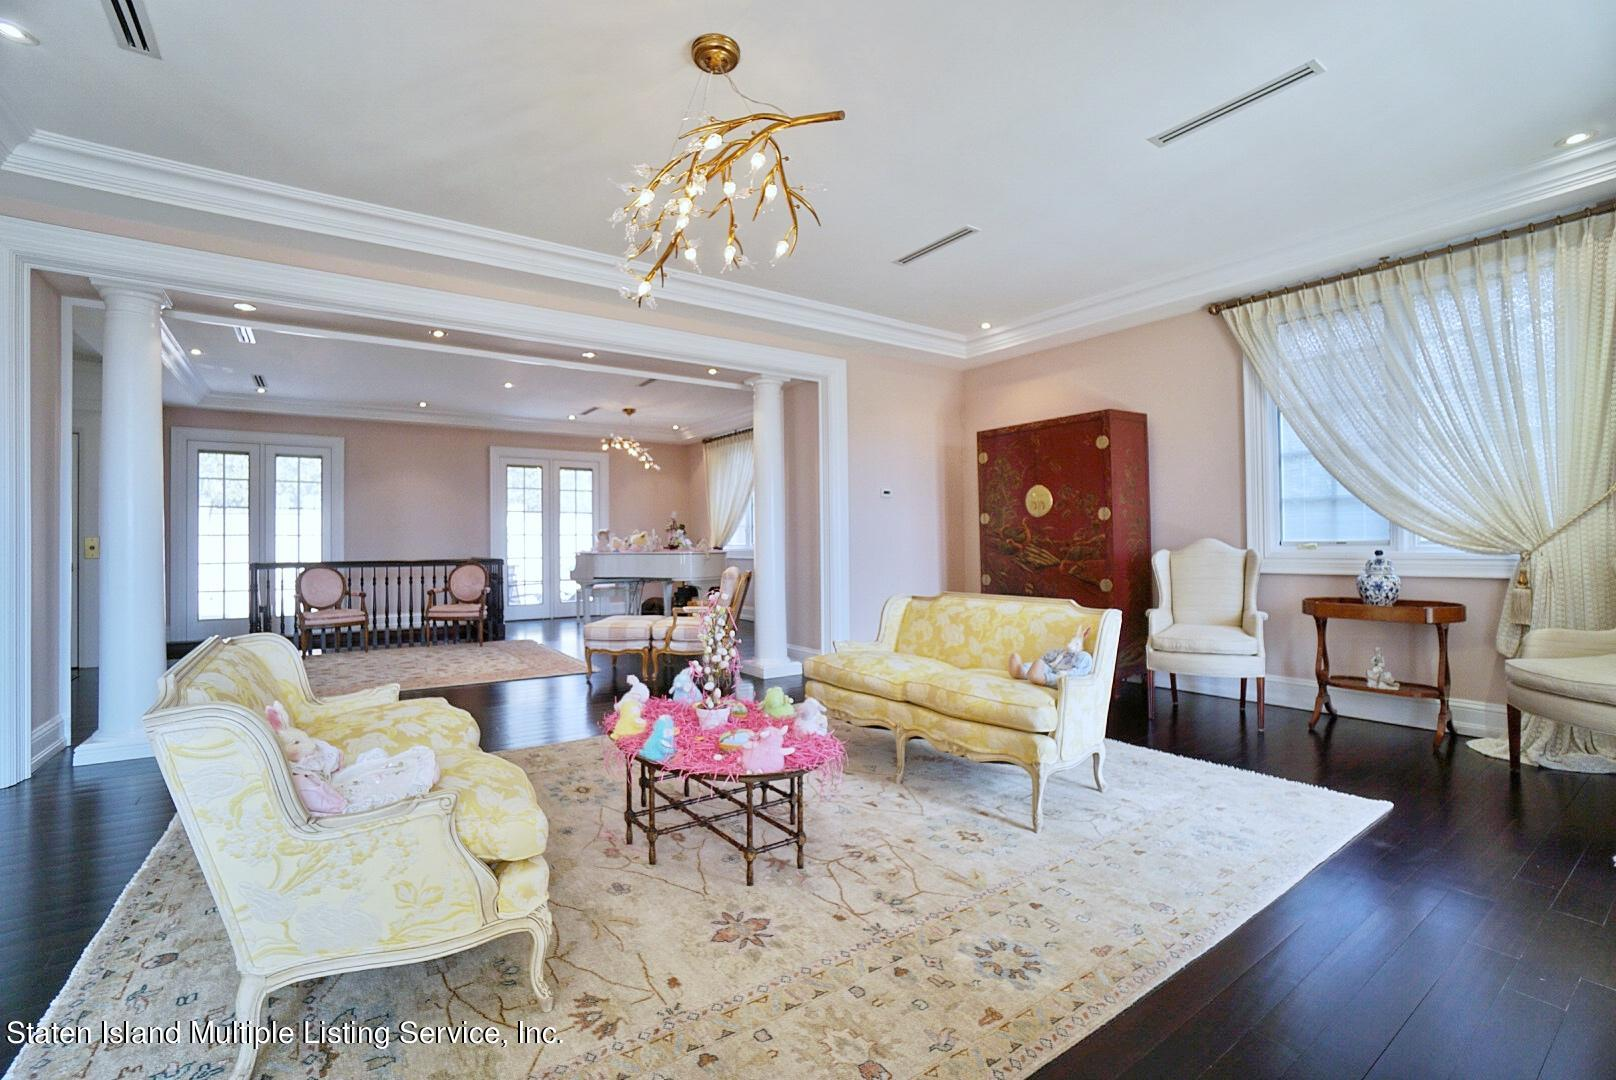 Single Family - Detached 129 Coverly Avenue   Staten Island, NY 10301, MLS-1144490-20